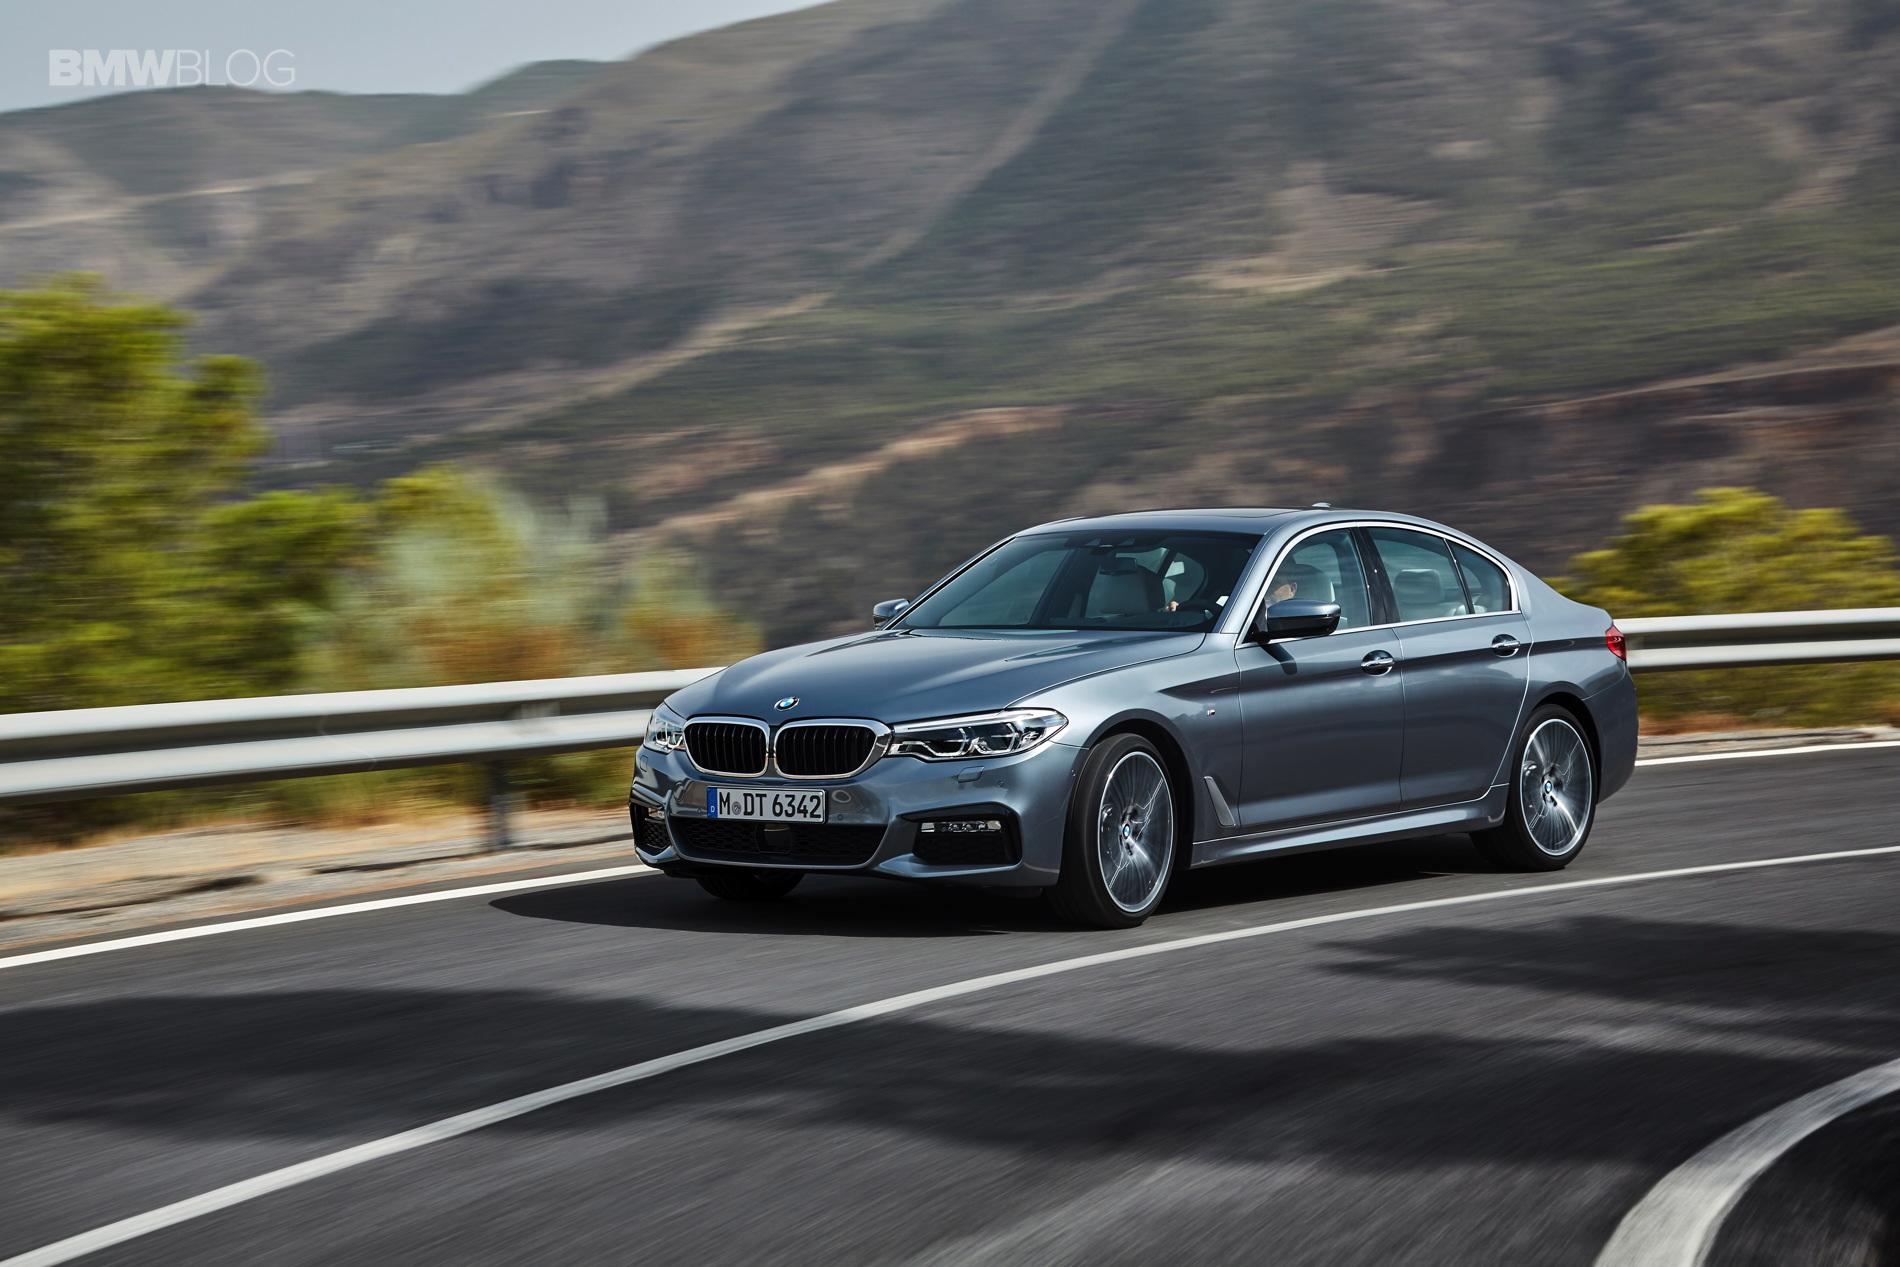 BMW G30 5 Series M Sport exterior 30